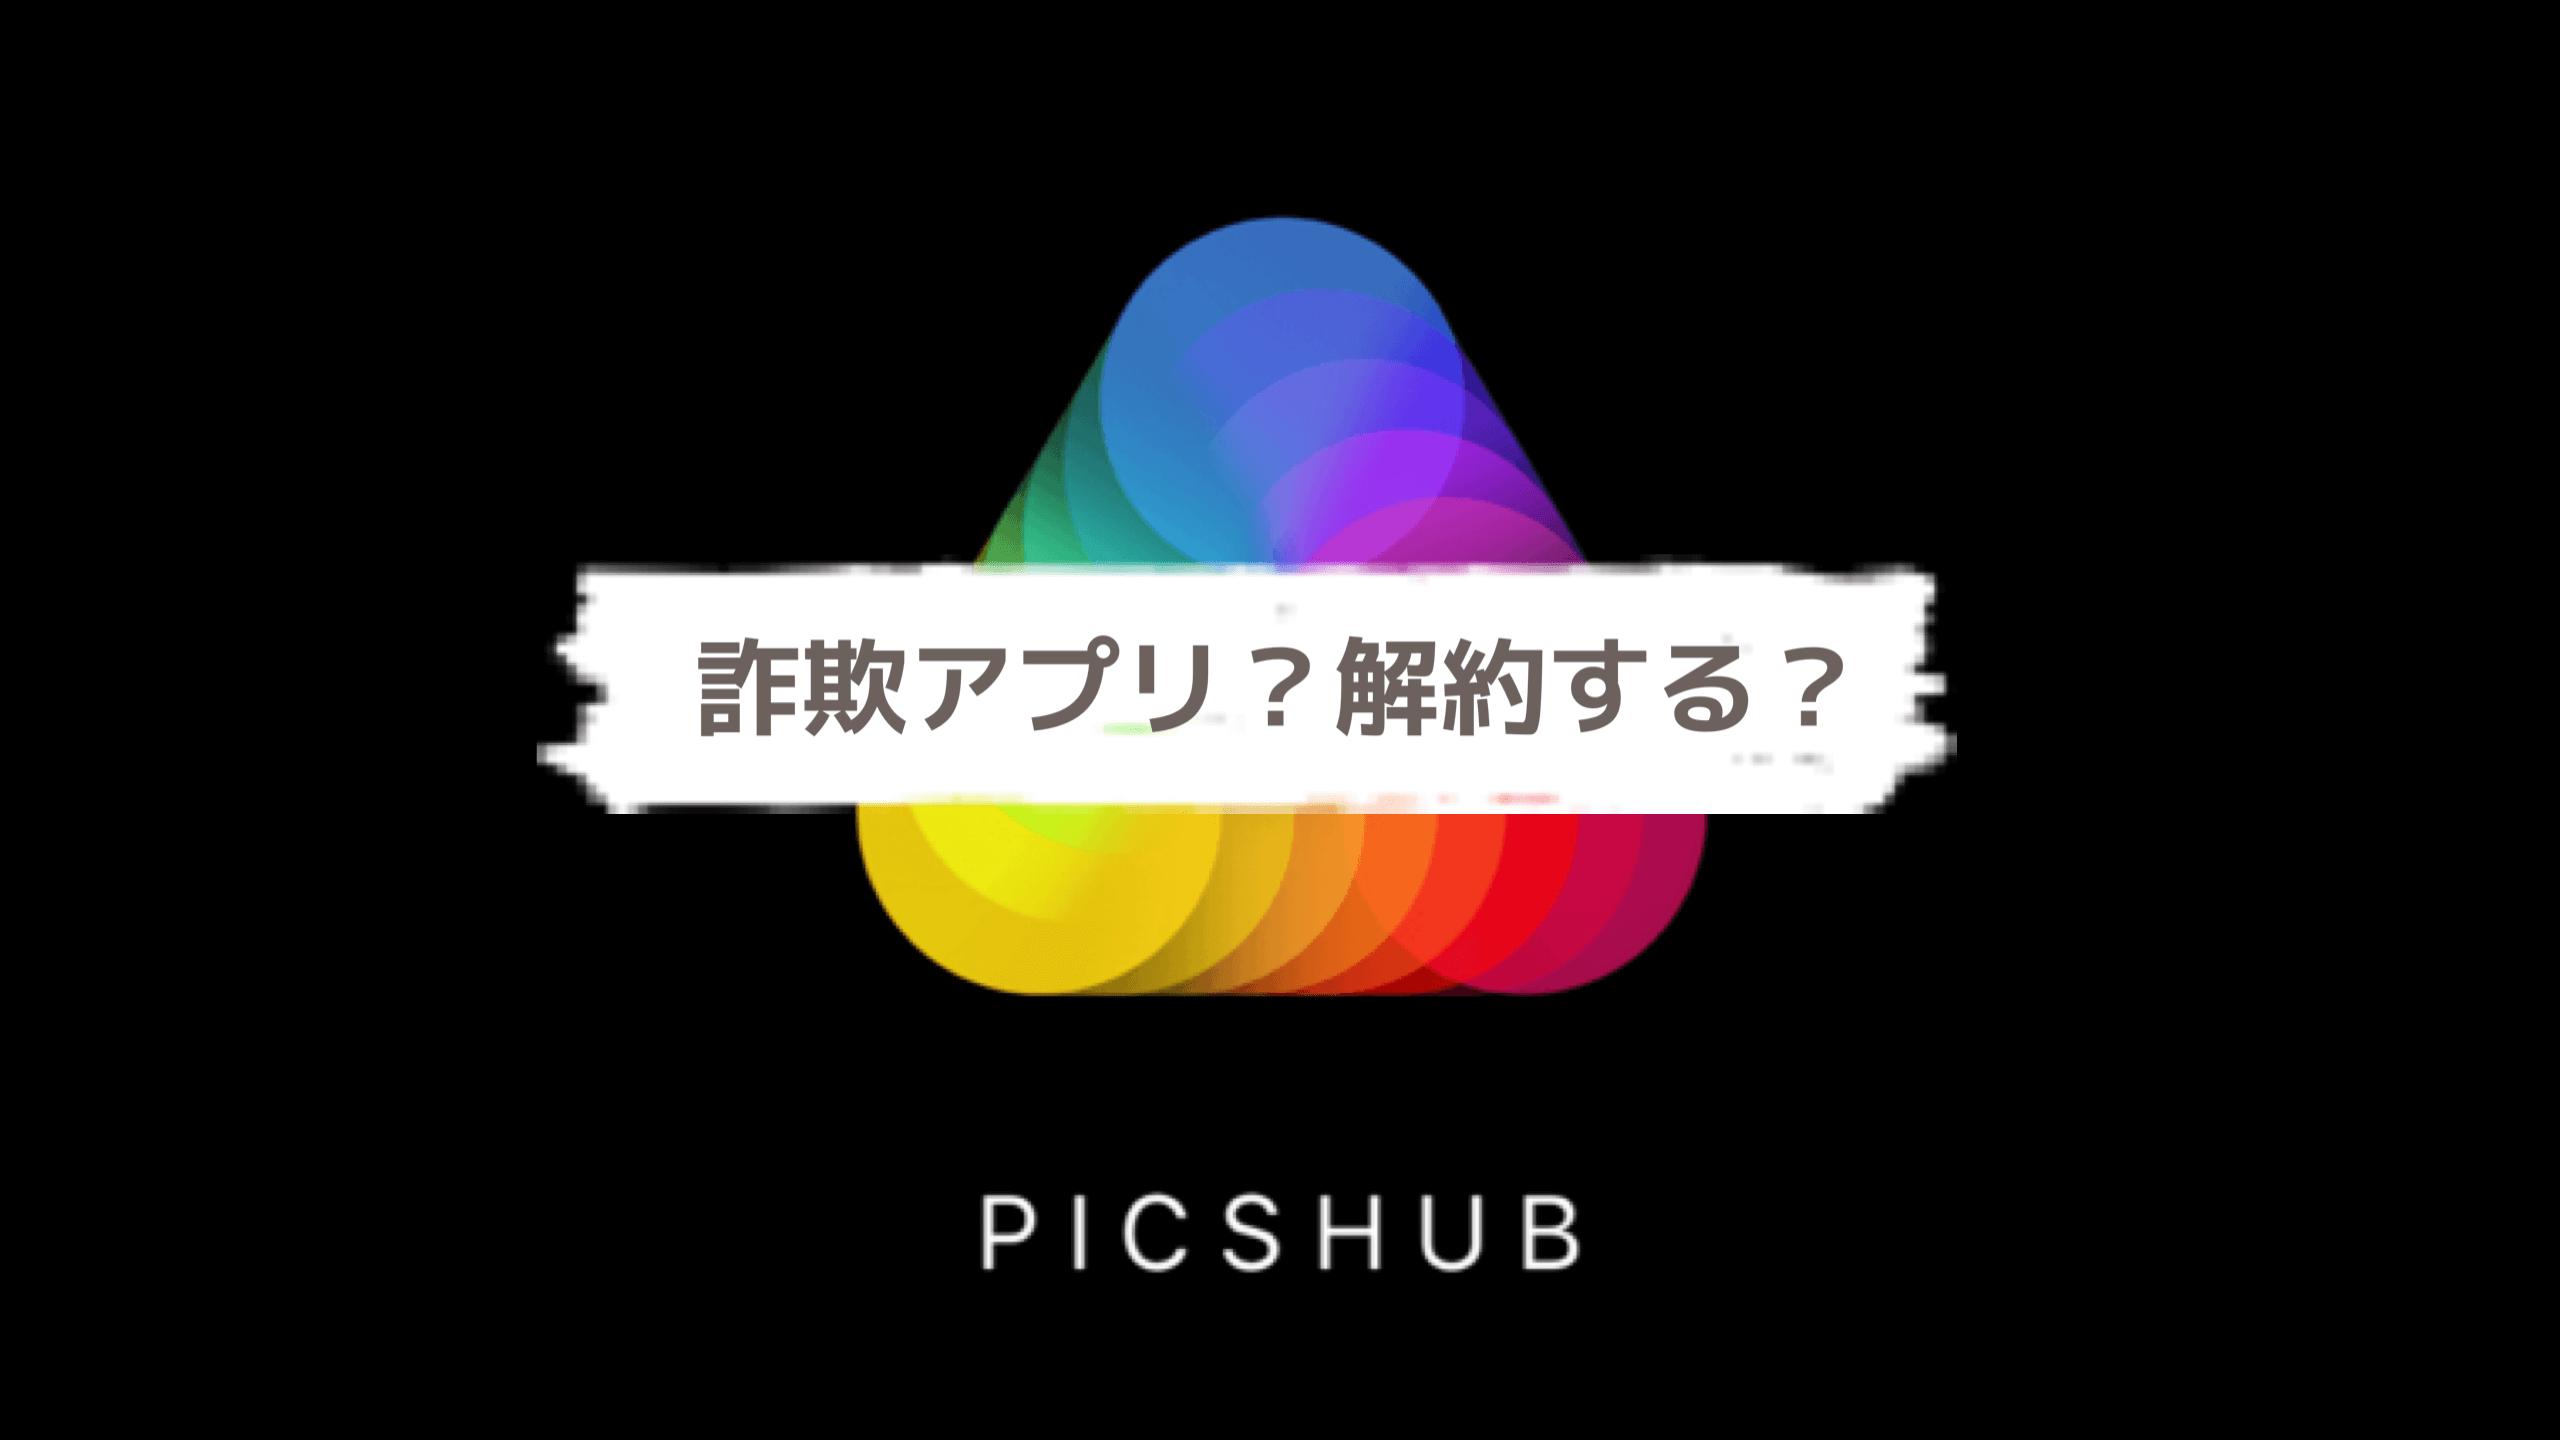 Pics Hubは詐欺?月額課金の解約(退会・キャンセル)方法